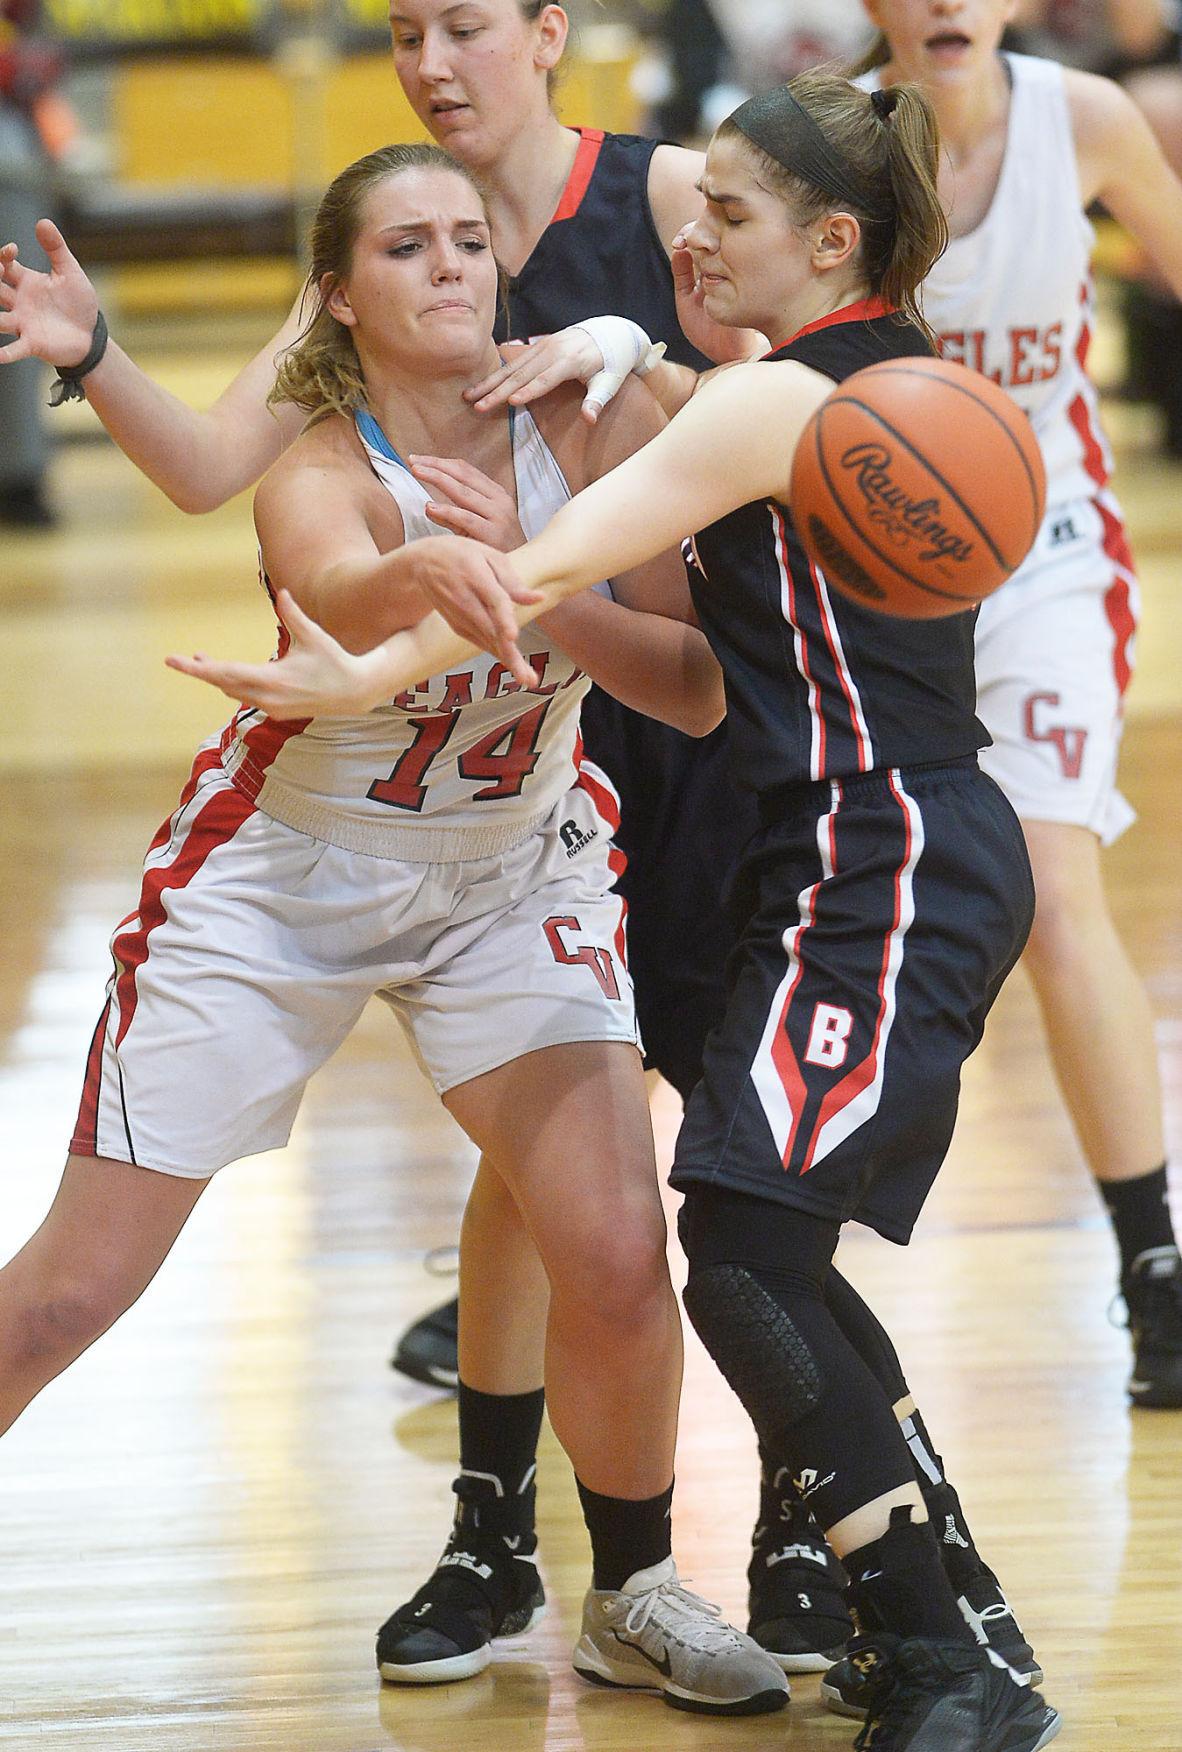 PIAA Class 6A Girls Basketball: Cumberland Valley vs Boyertwon